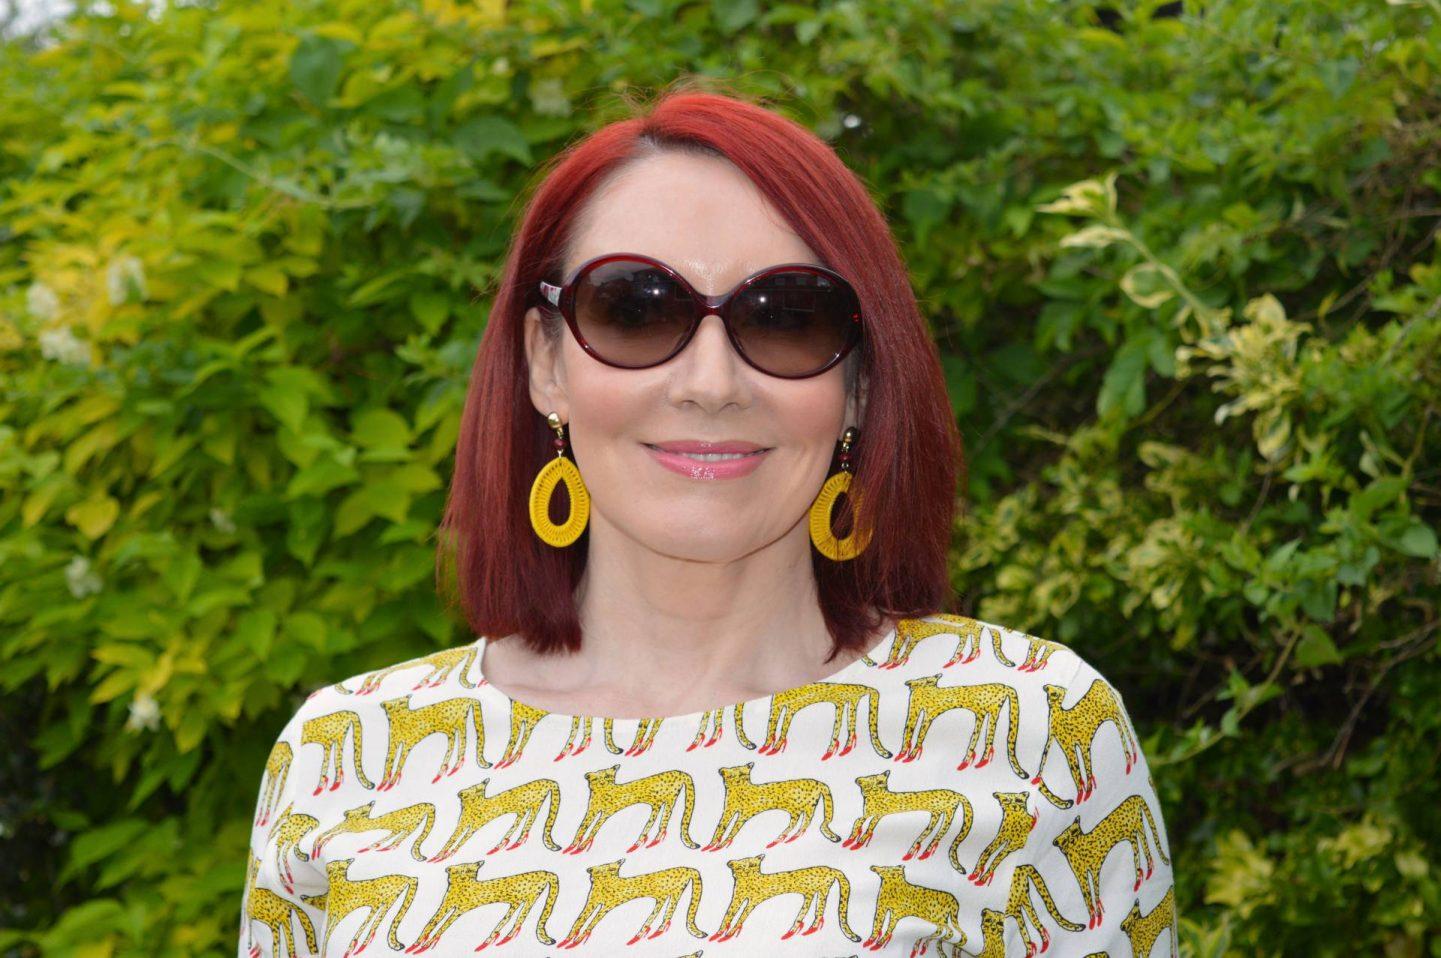 Fabienne Chapot cheetah print top, Asos red culottes